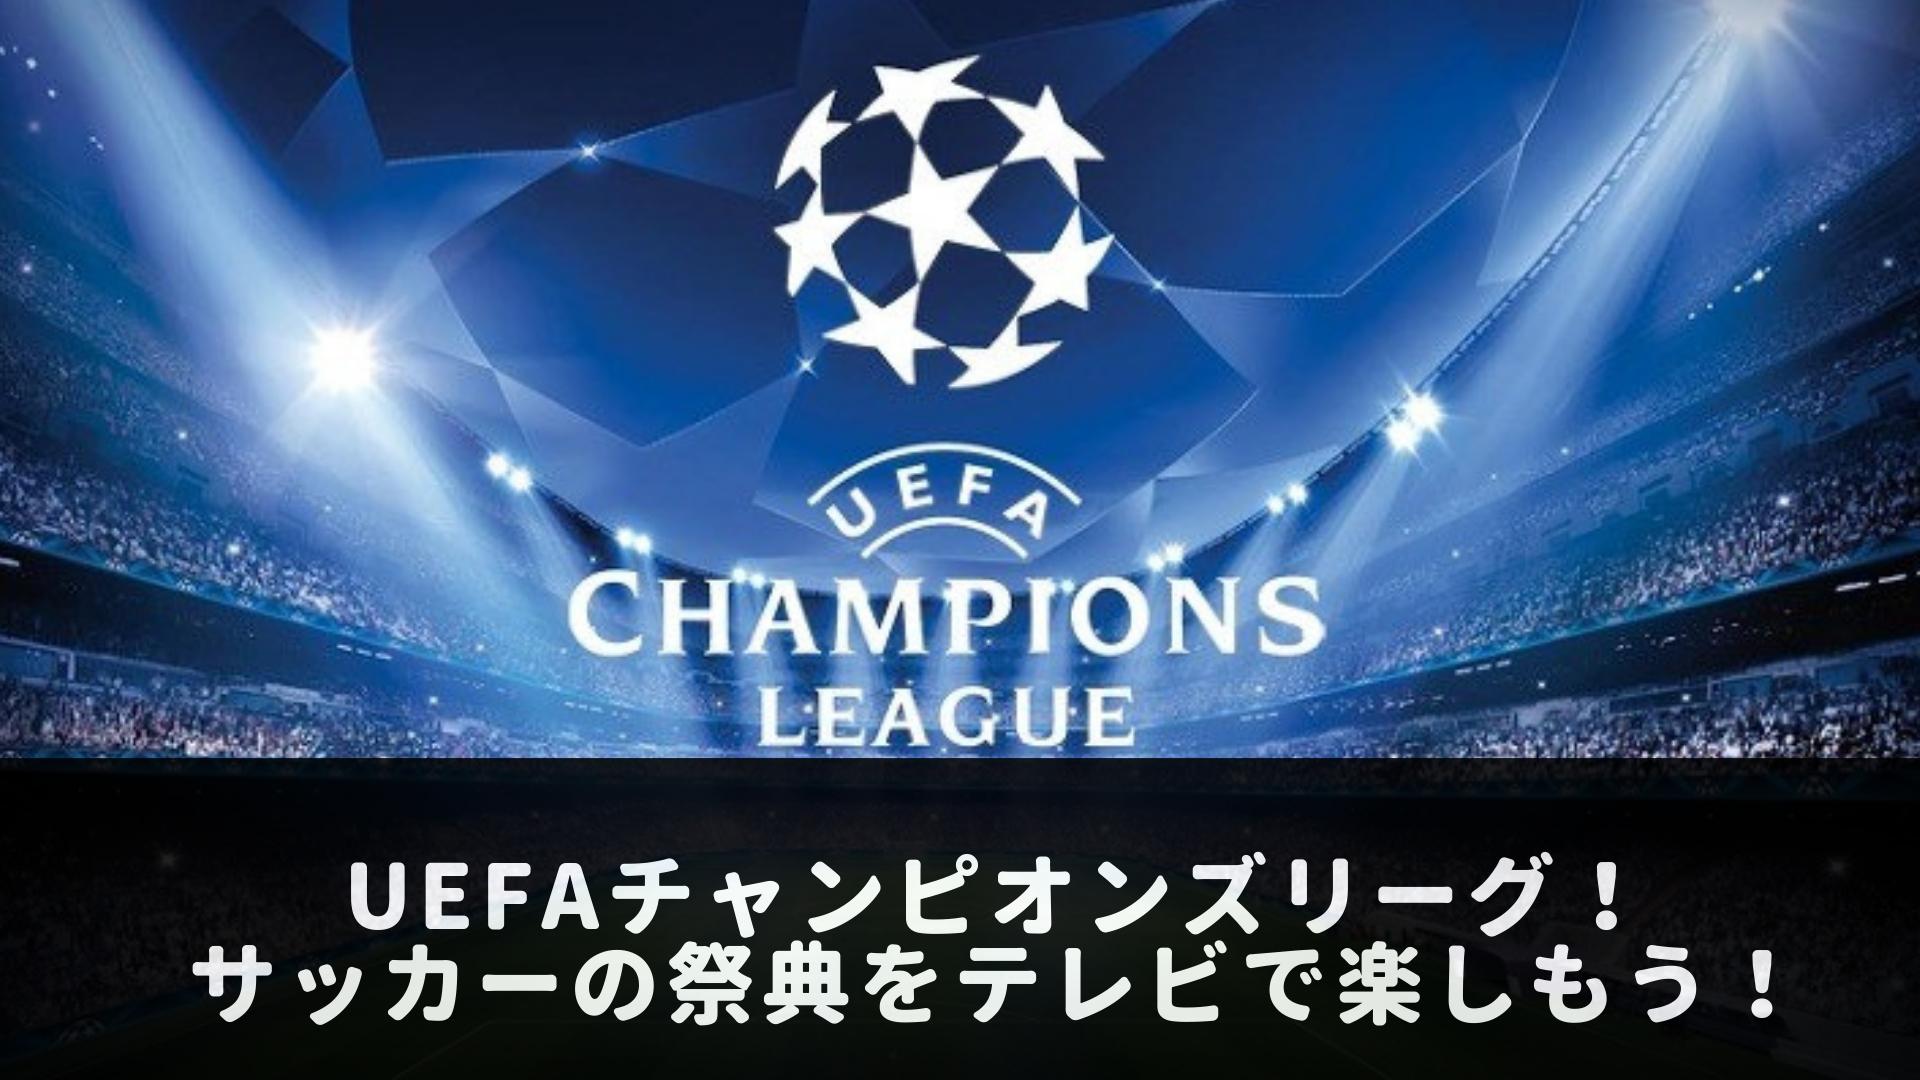 2019 2020 Uefaチャンピオンズリーグ放送 中継 をテレビで見る方法